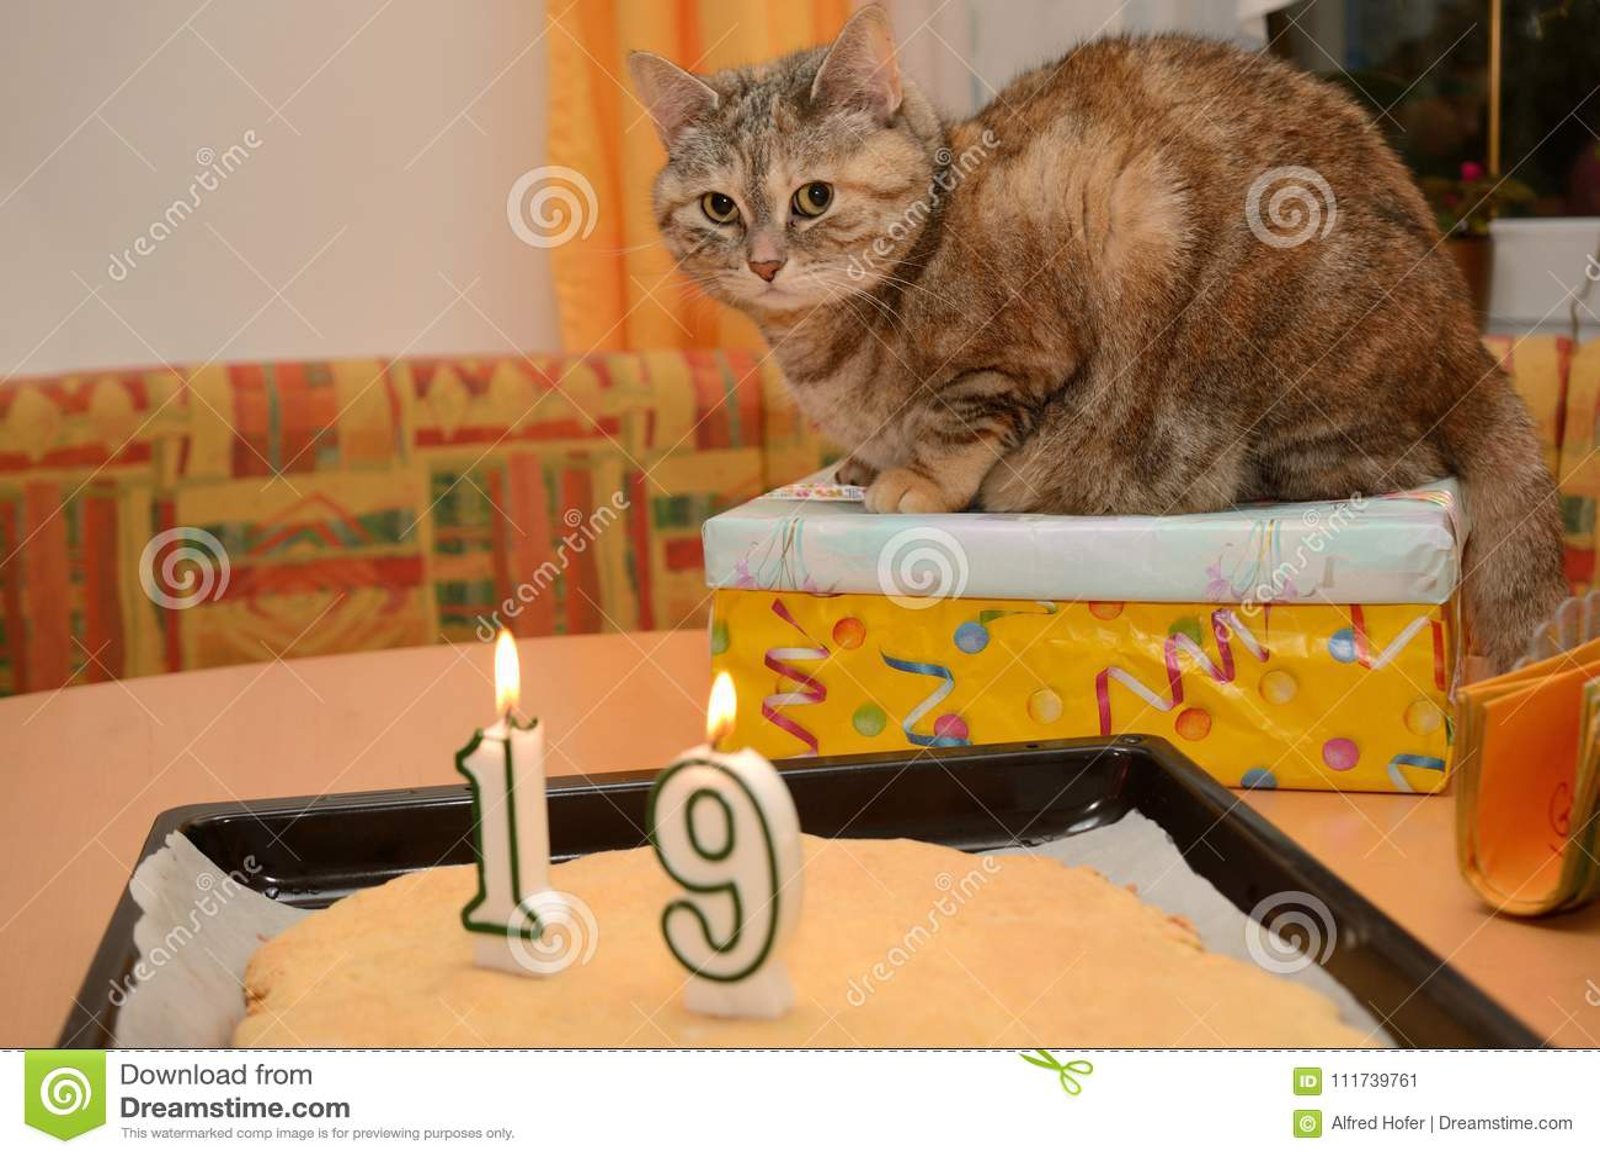 Cat celebrates birthday - presents for cat